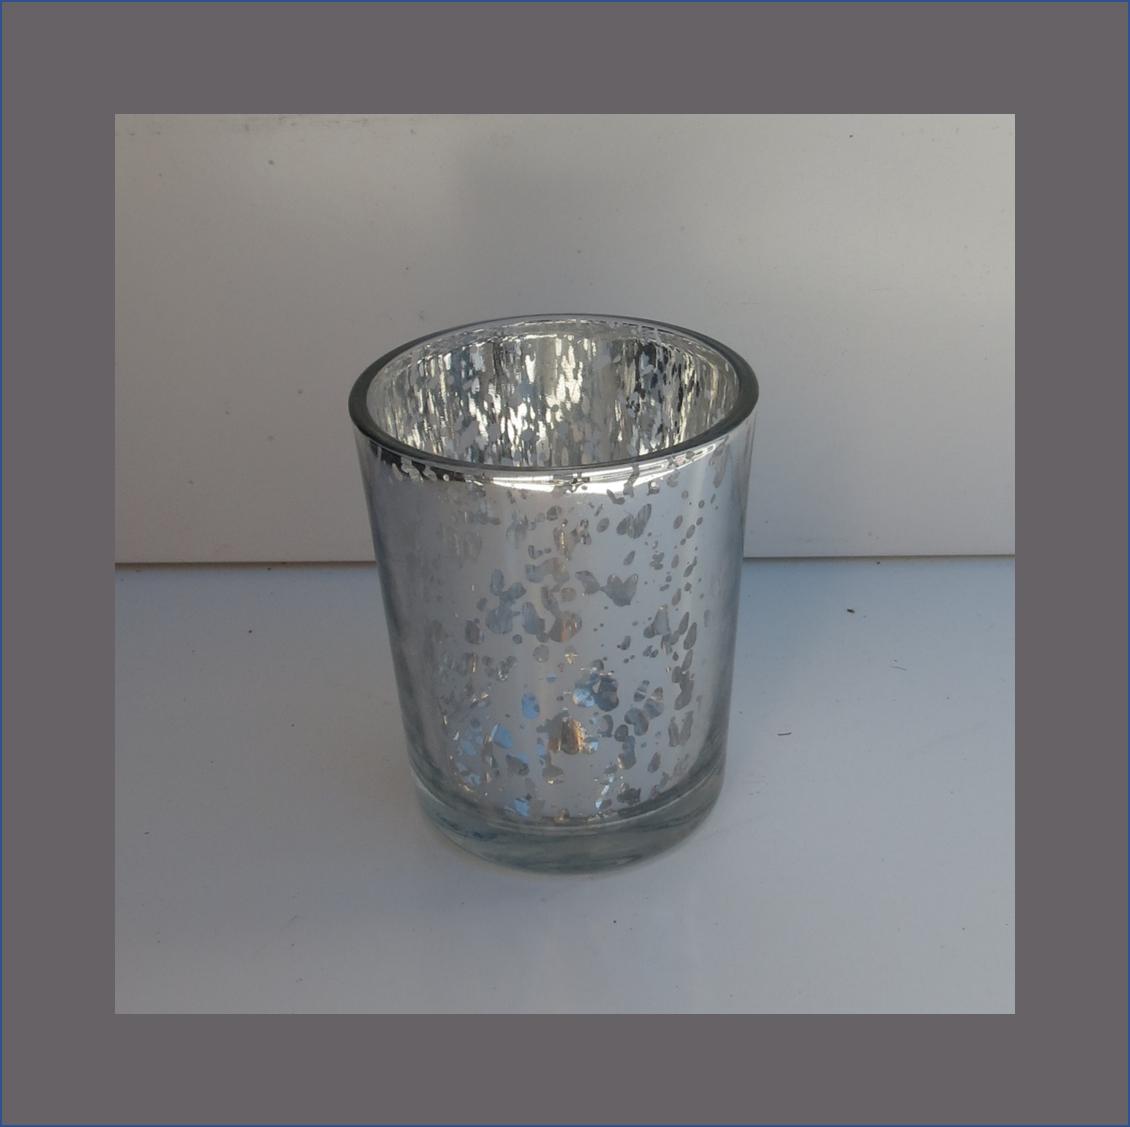 silver-speccle-vase-small